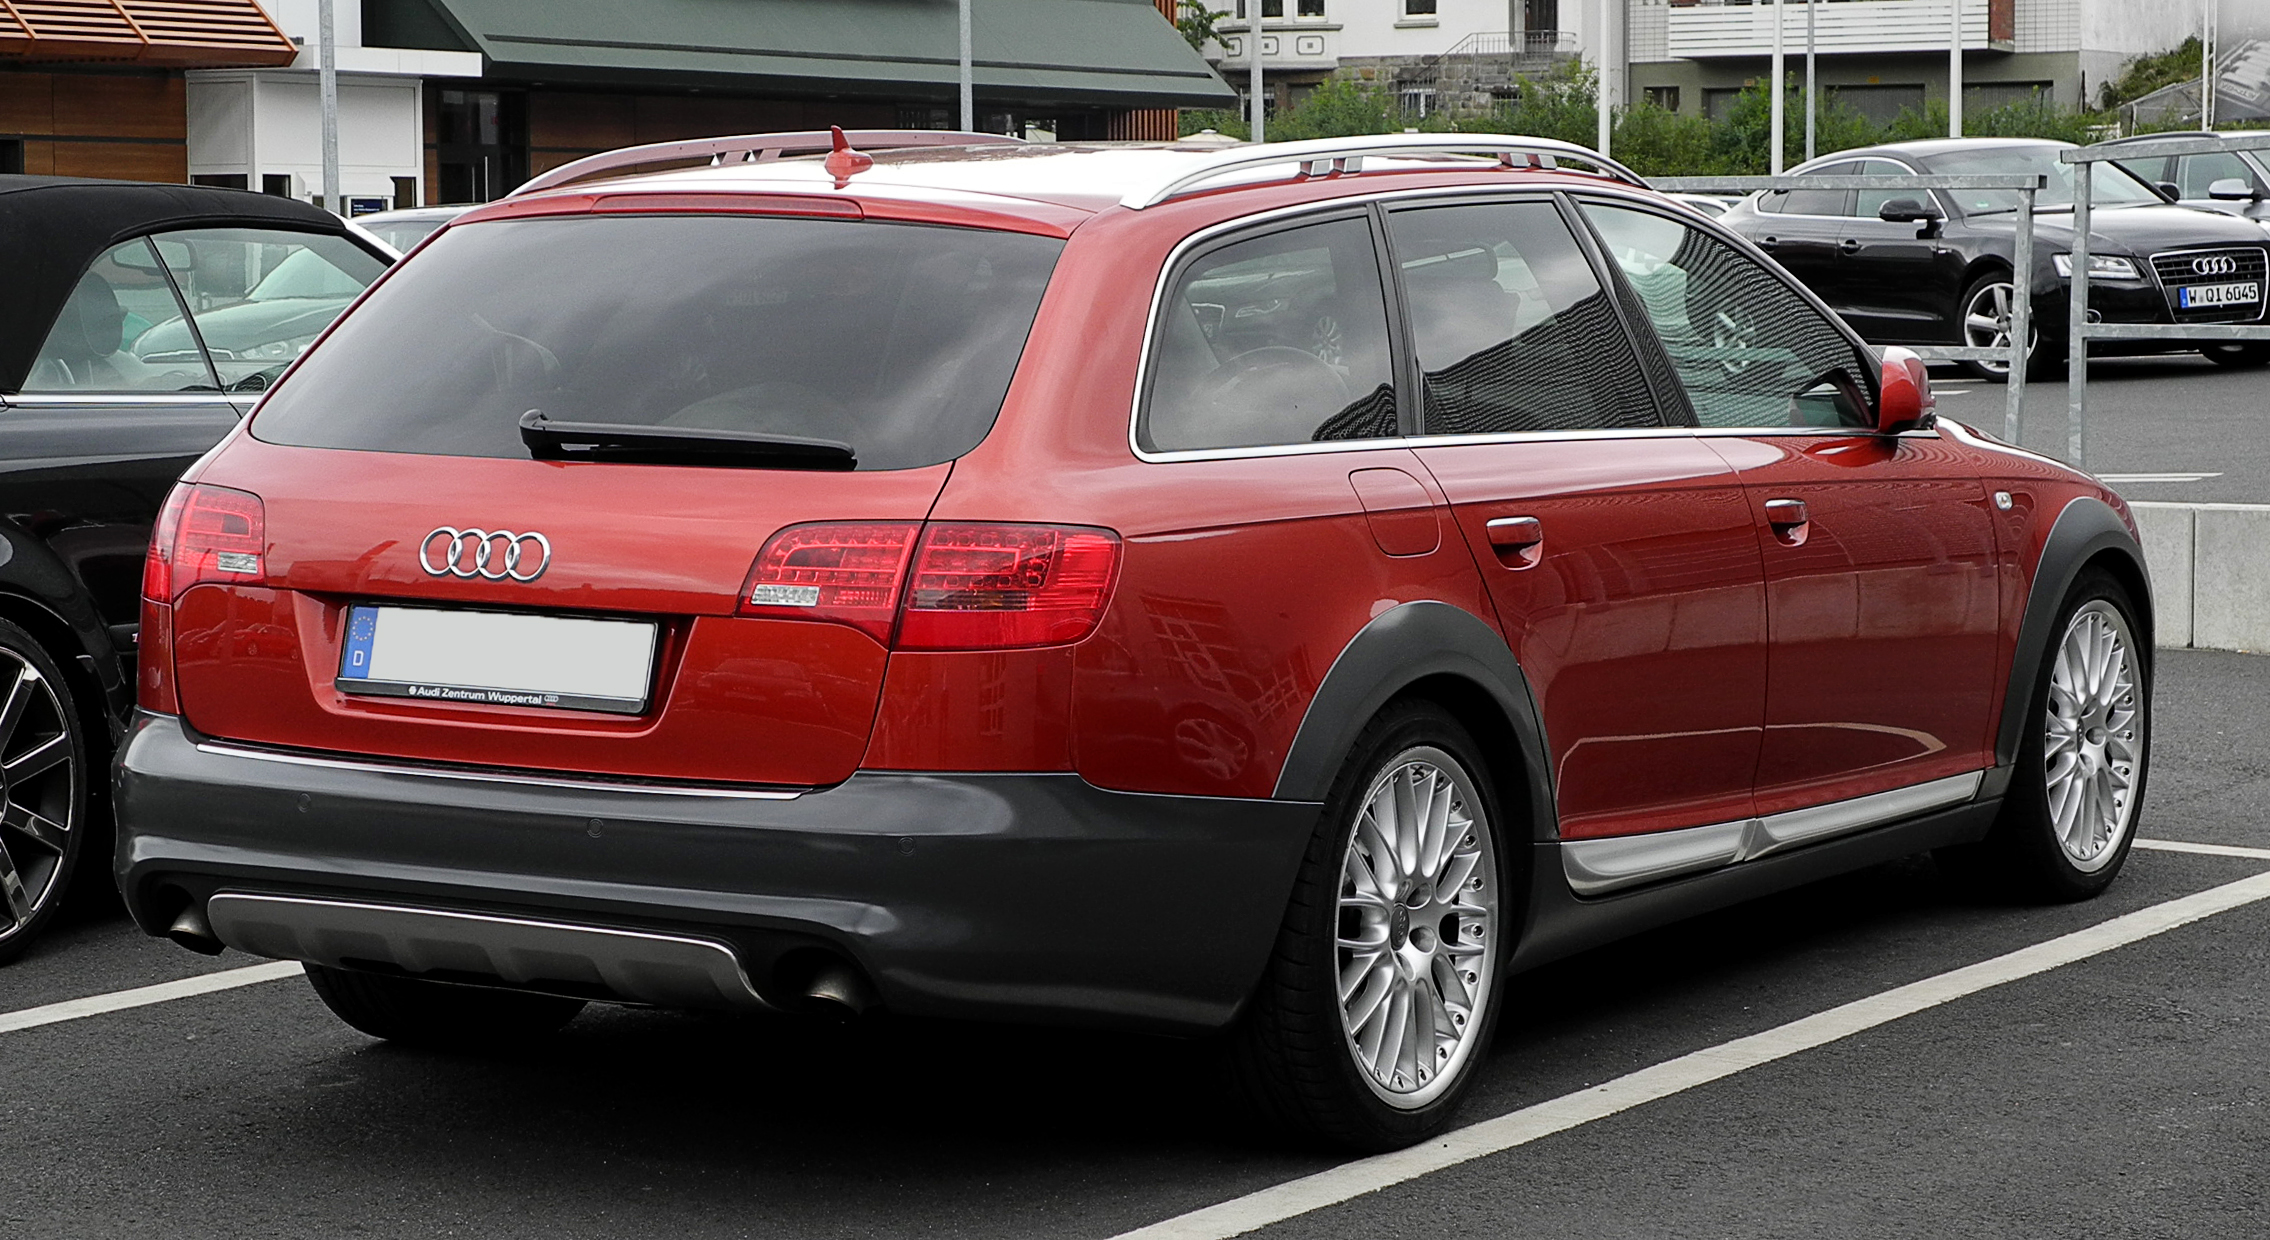 Audi_A6_allroad_quattro_3.0_TDI_(C6)_%E2%80%93_Heckansicht,_13._Juni_2011,_Wuppertal.jpg